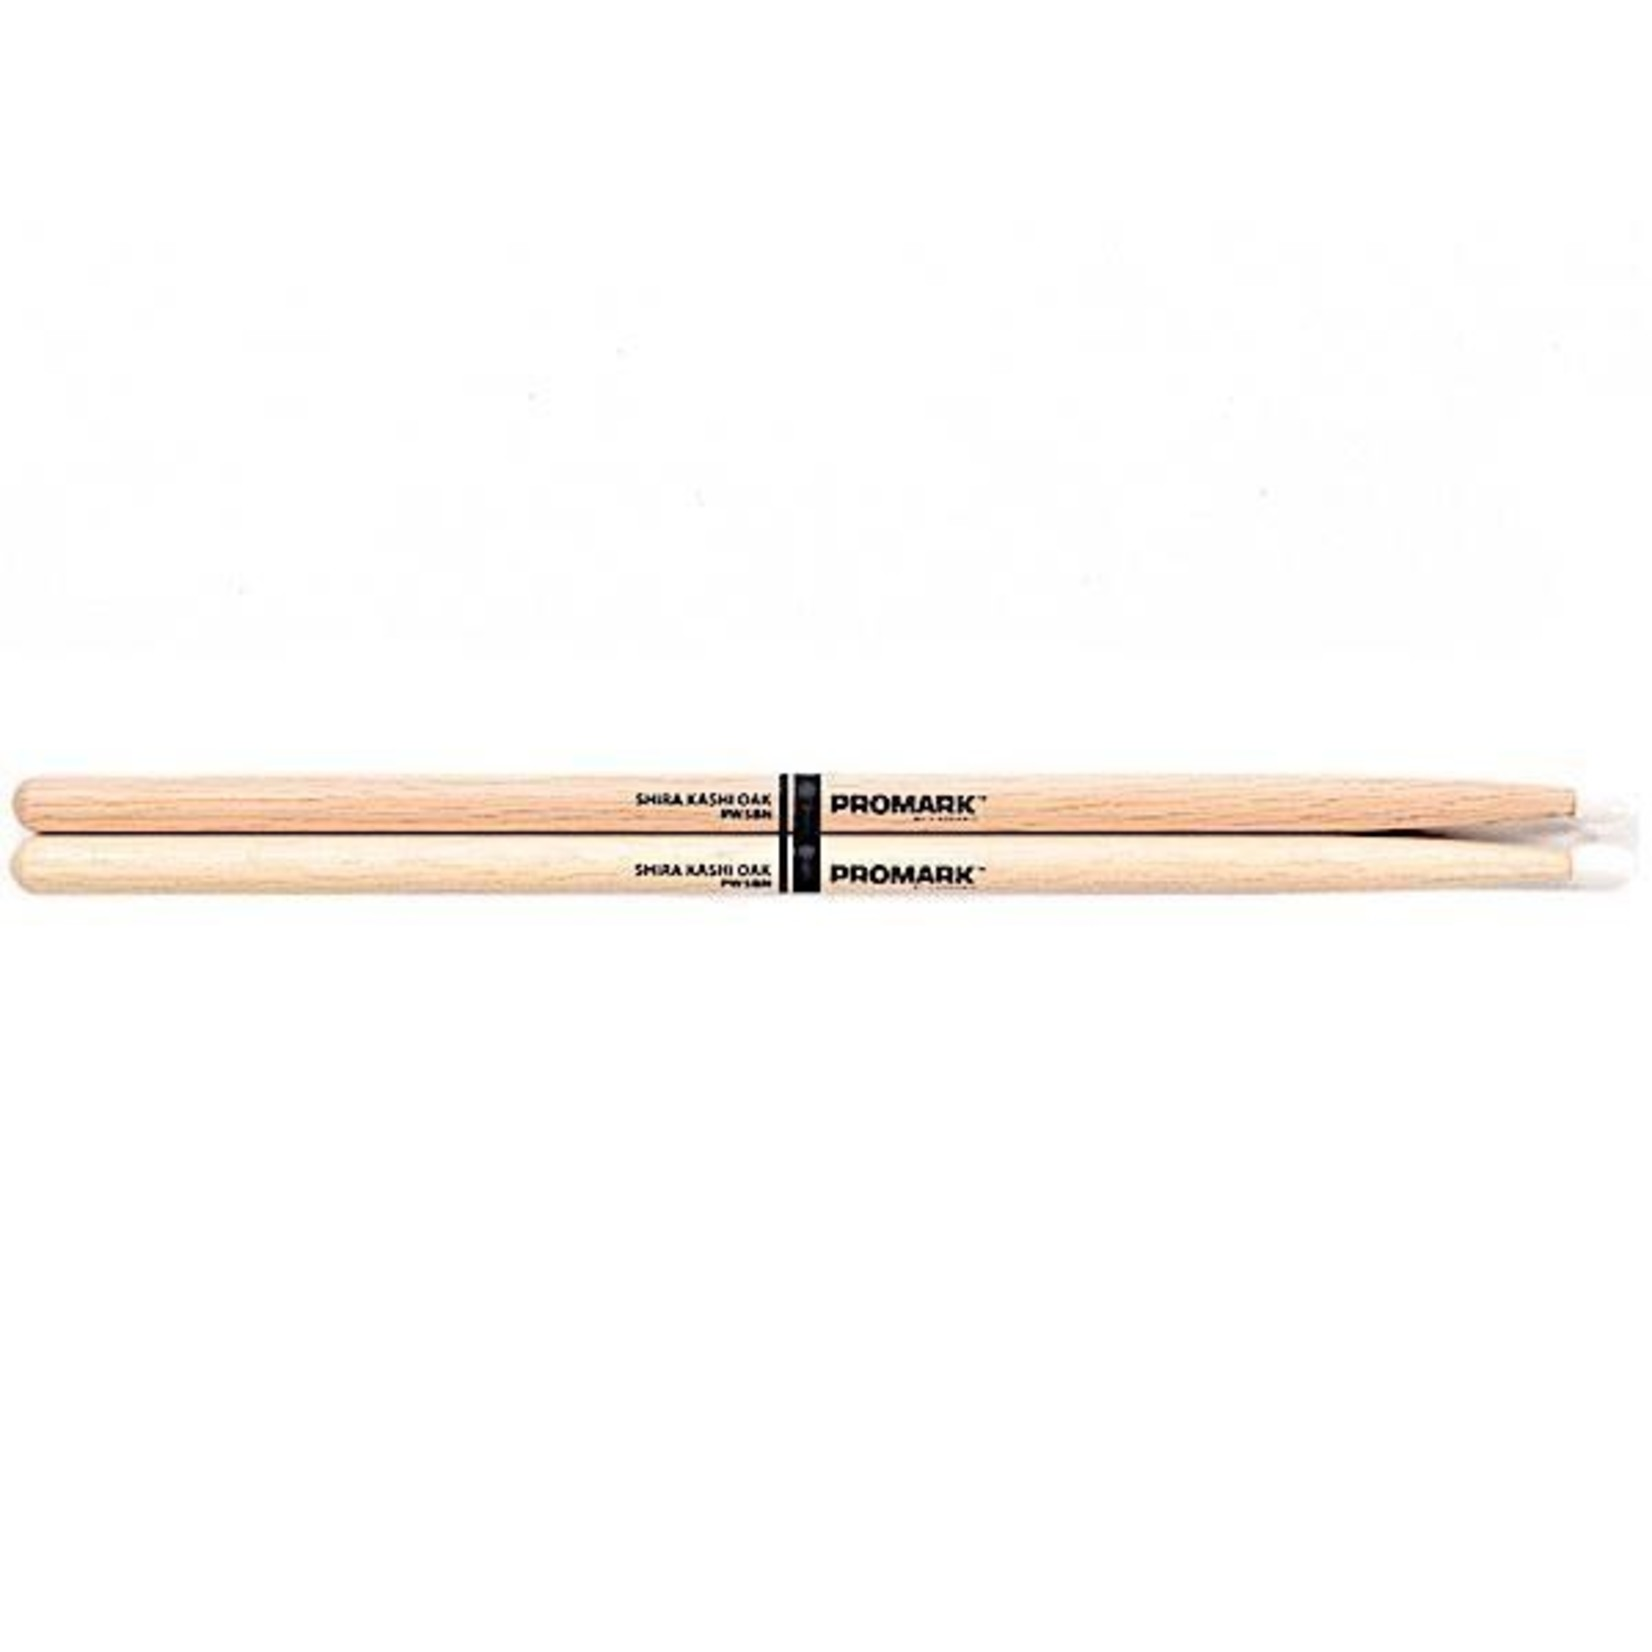 Promark ProMark Classic Shira Kashi Oak Attack 5B Nylon Tip Drumstick